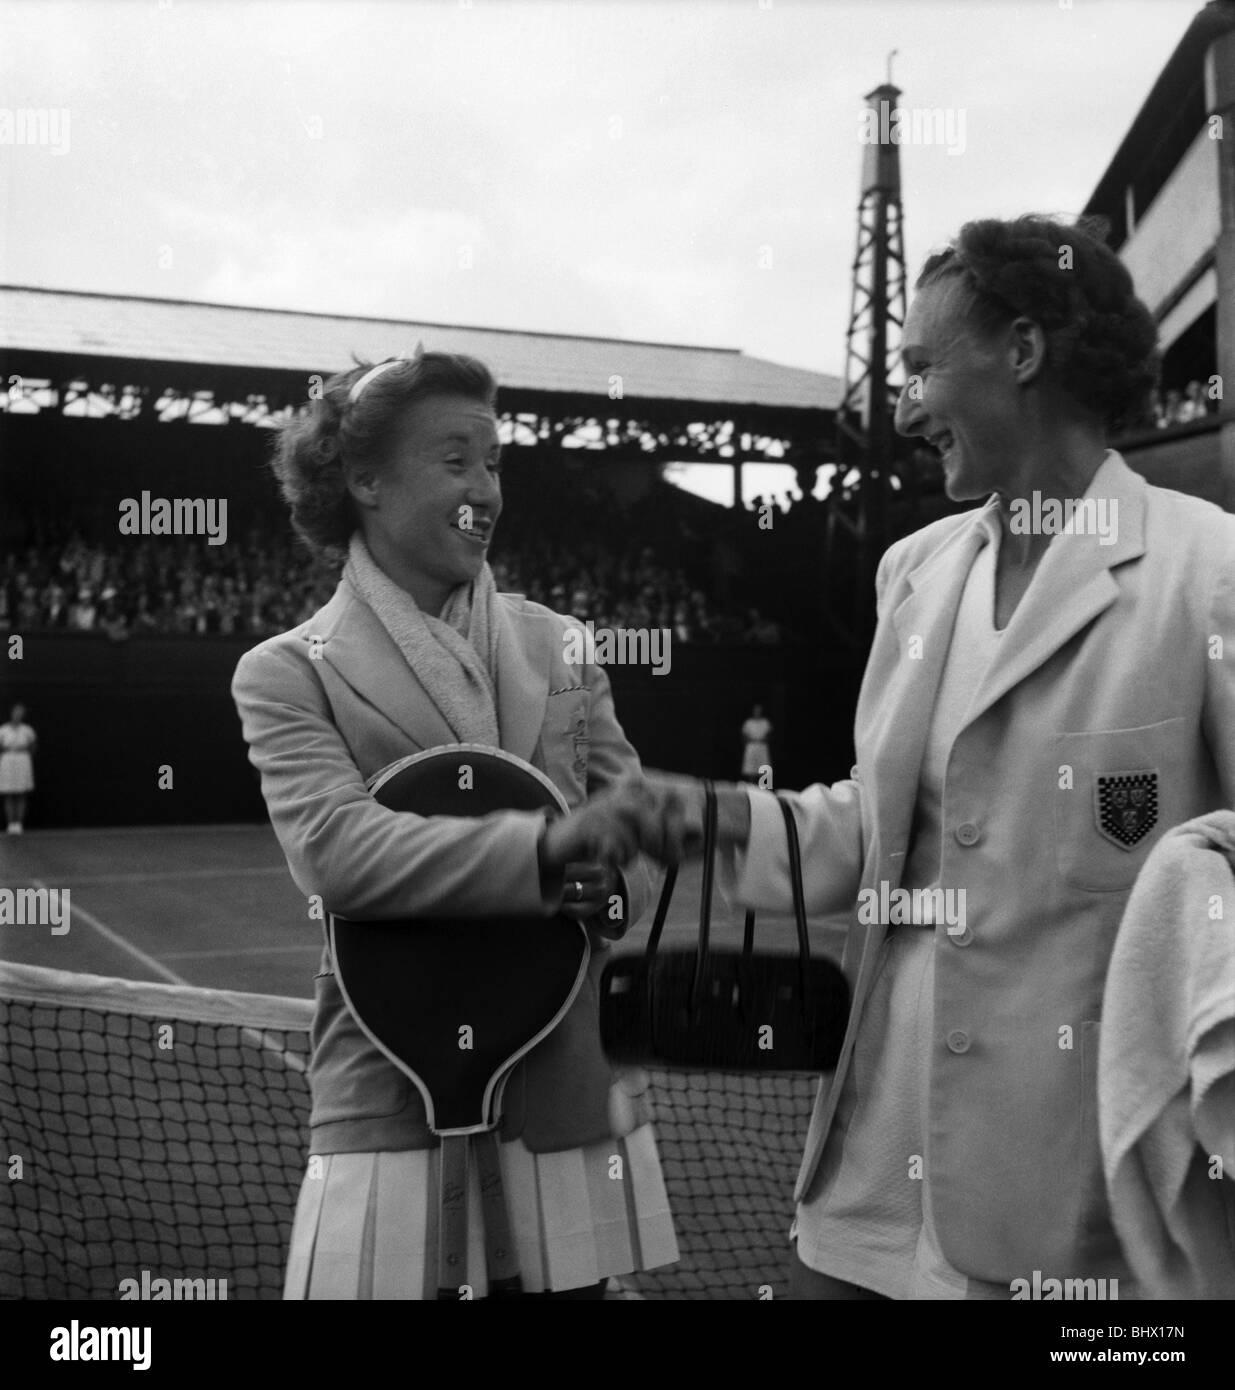 Wimbledon Wightman Cup Misses Maureen Connolly and J j Walker